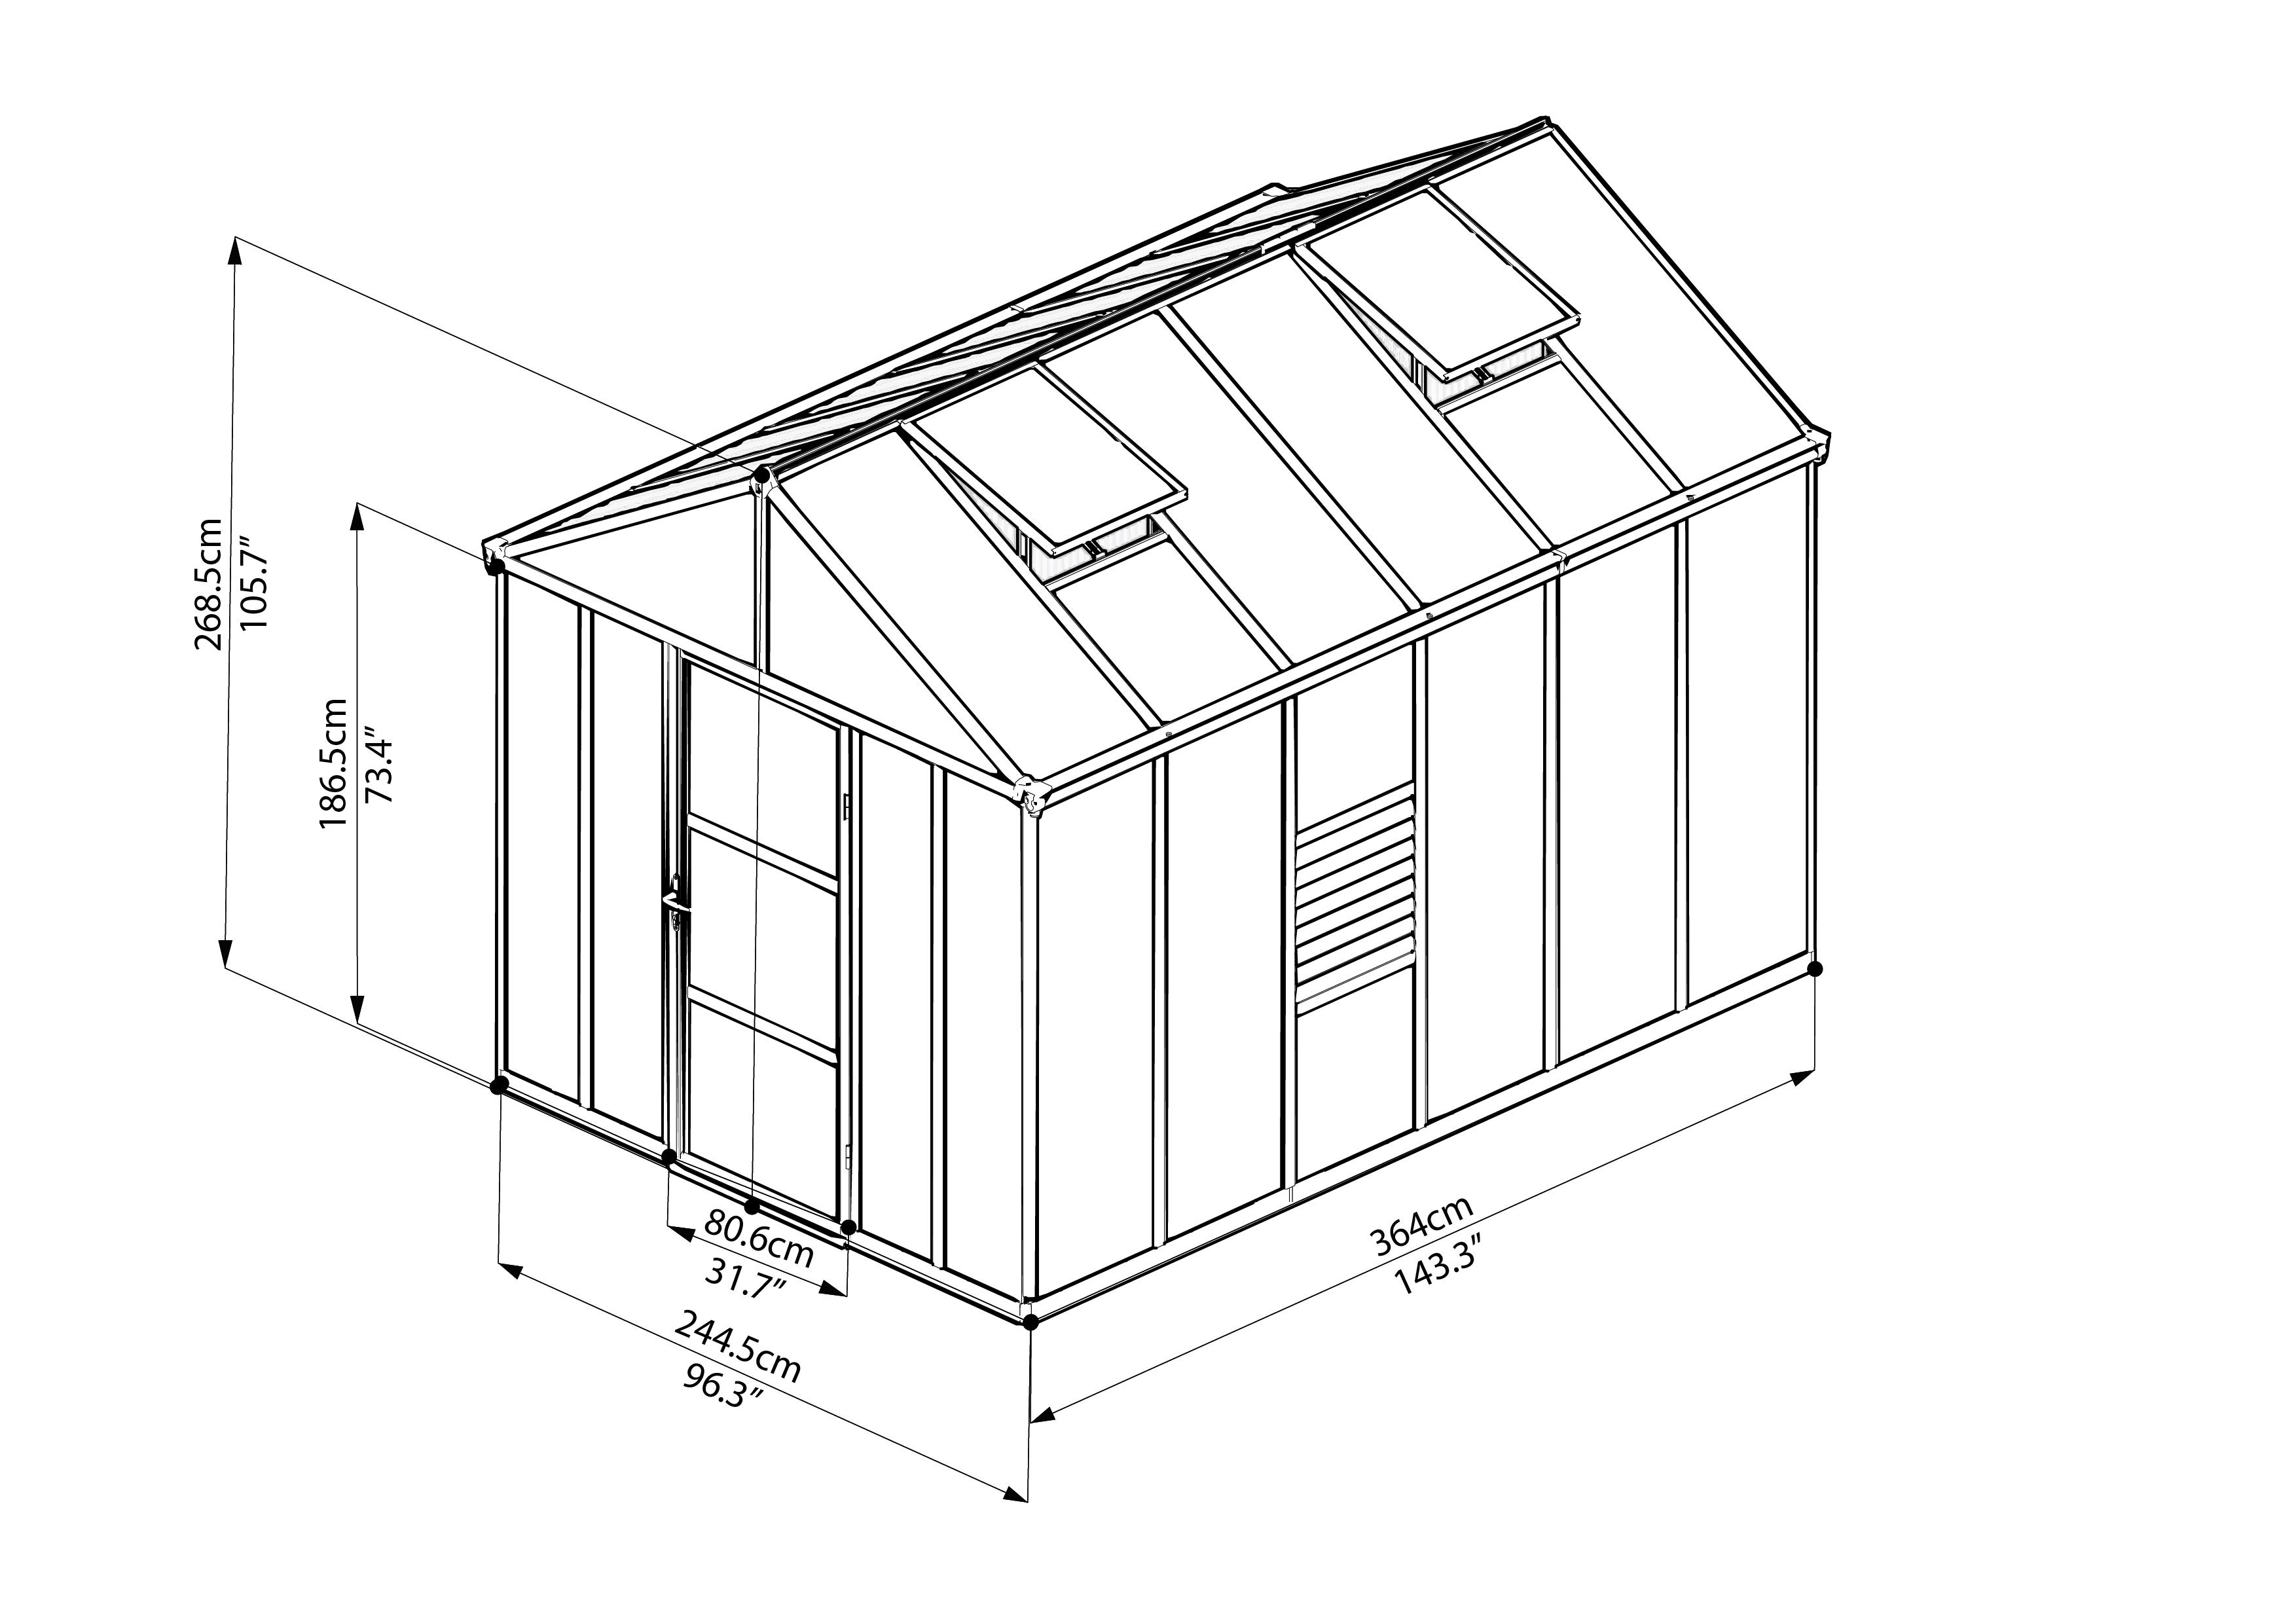 palram-greenhouses-glory-8x12-drawing-isoview.jpg